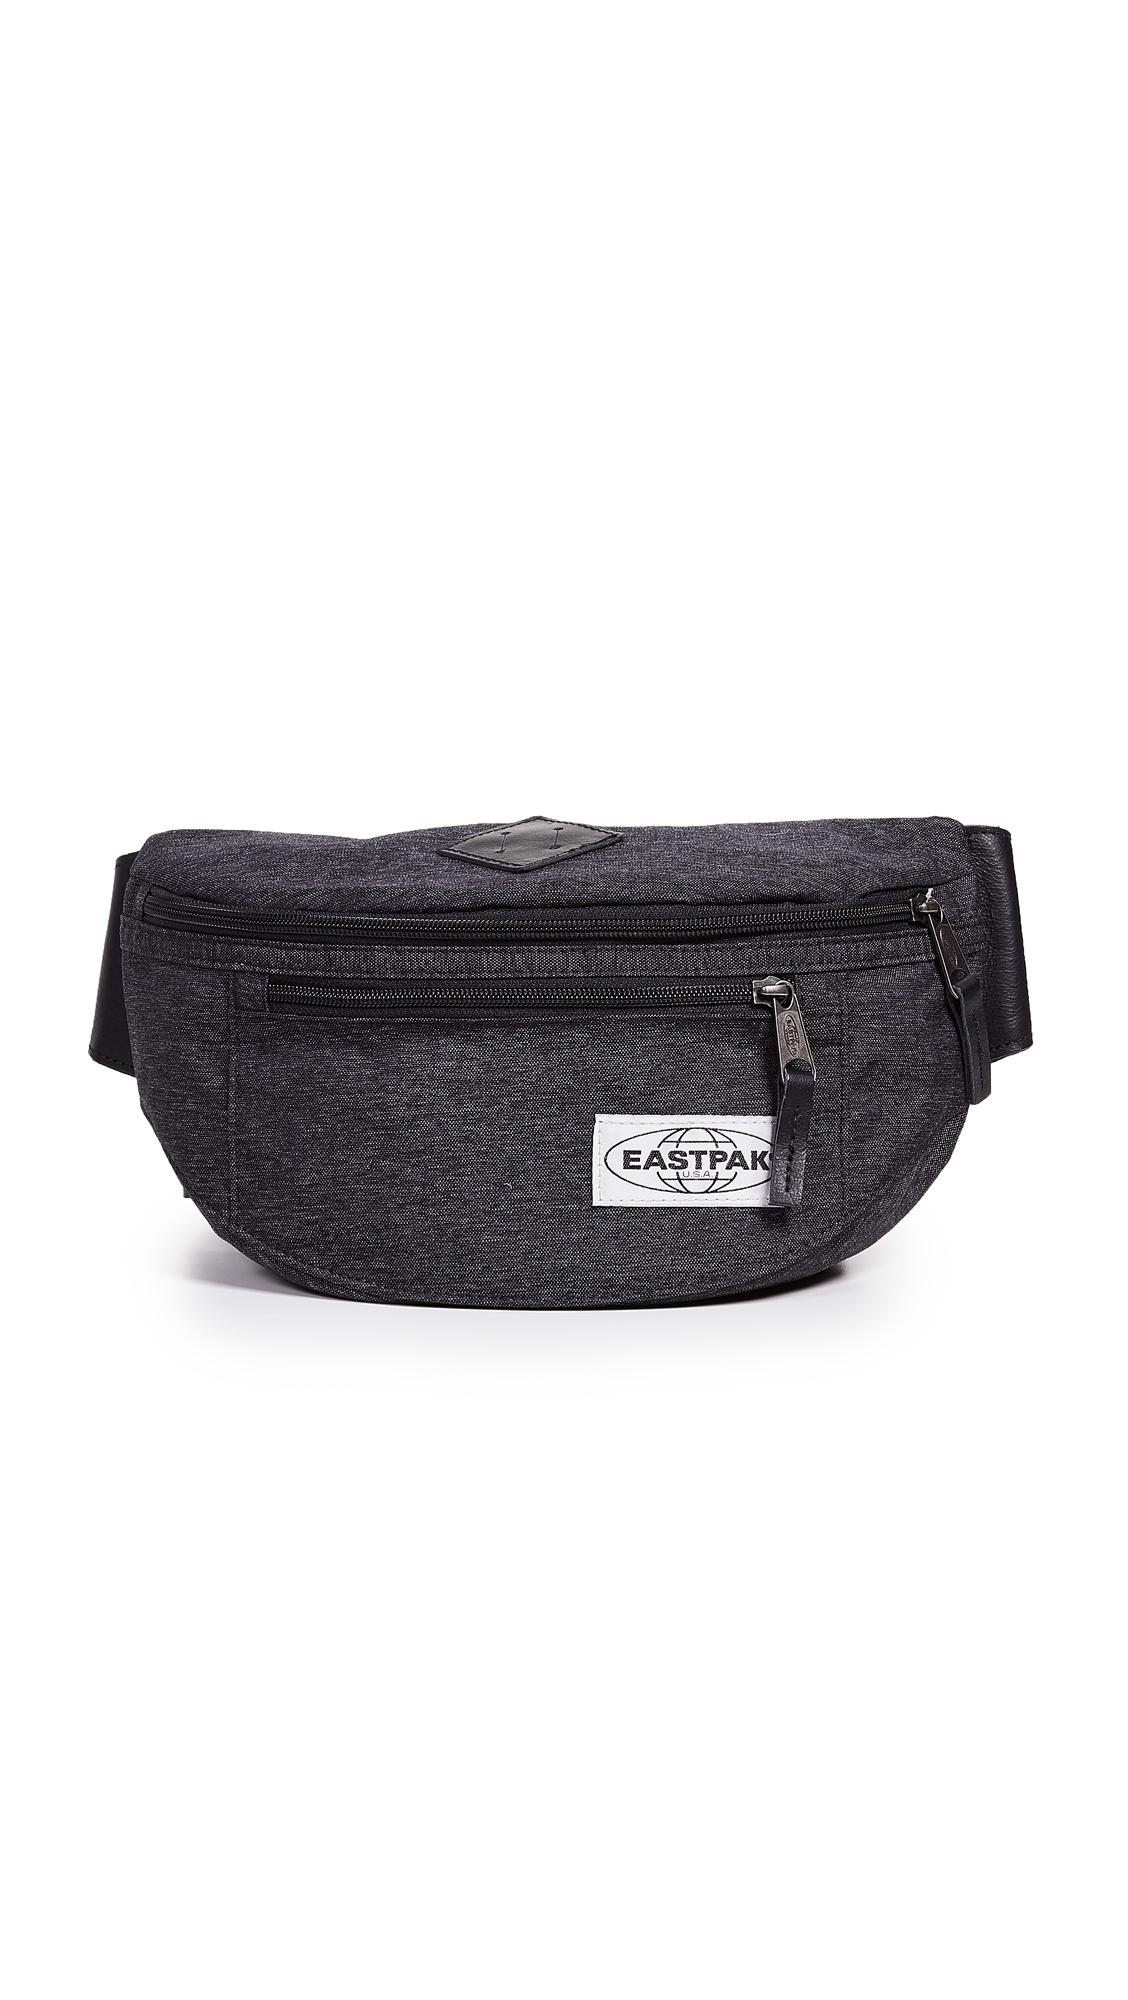 ab912ff0d76cb Eastpak Bundel Mini Bag In Into Camo